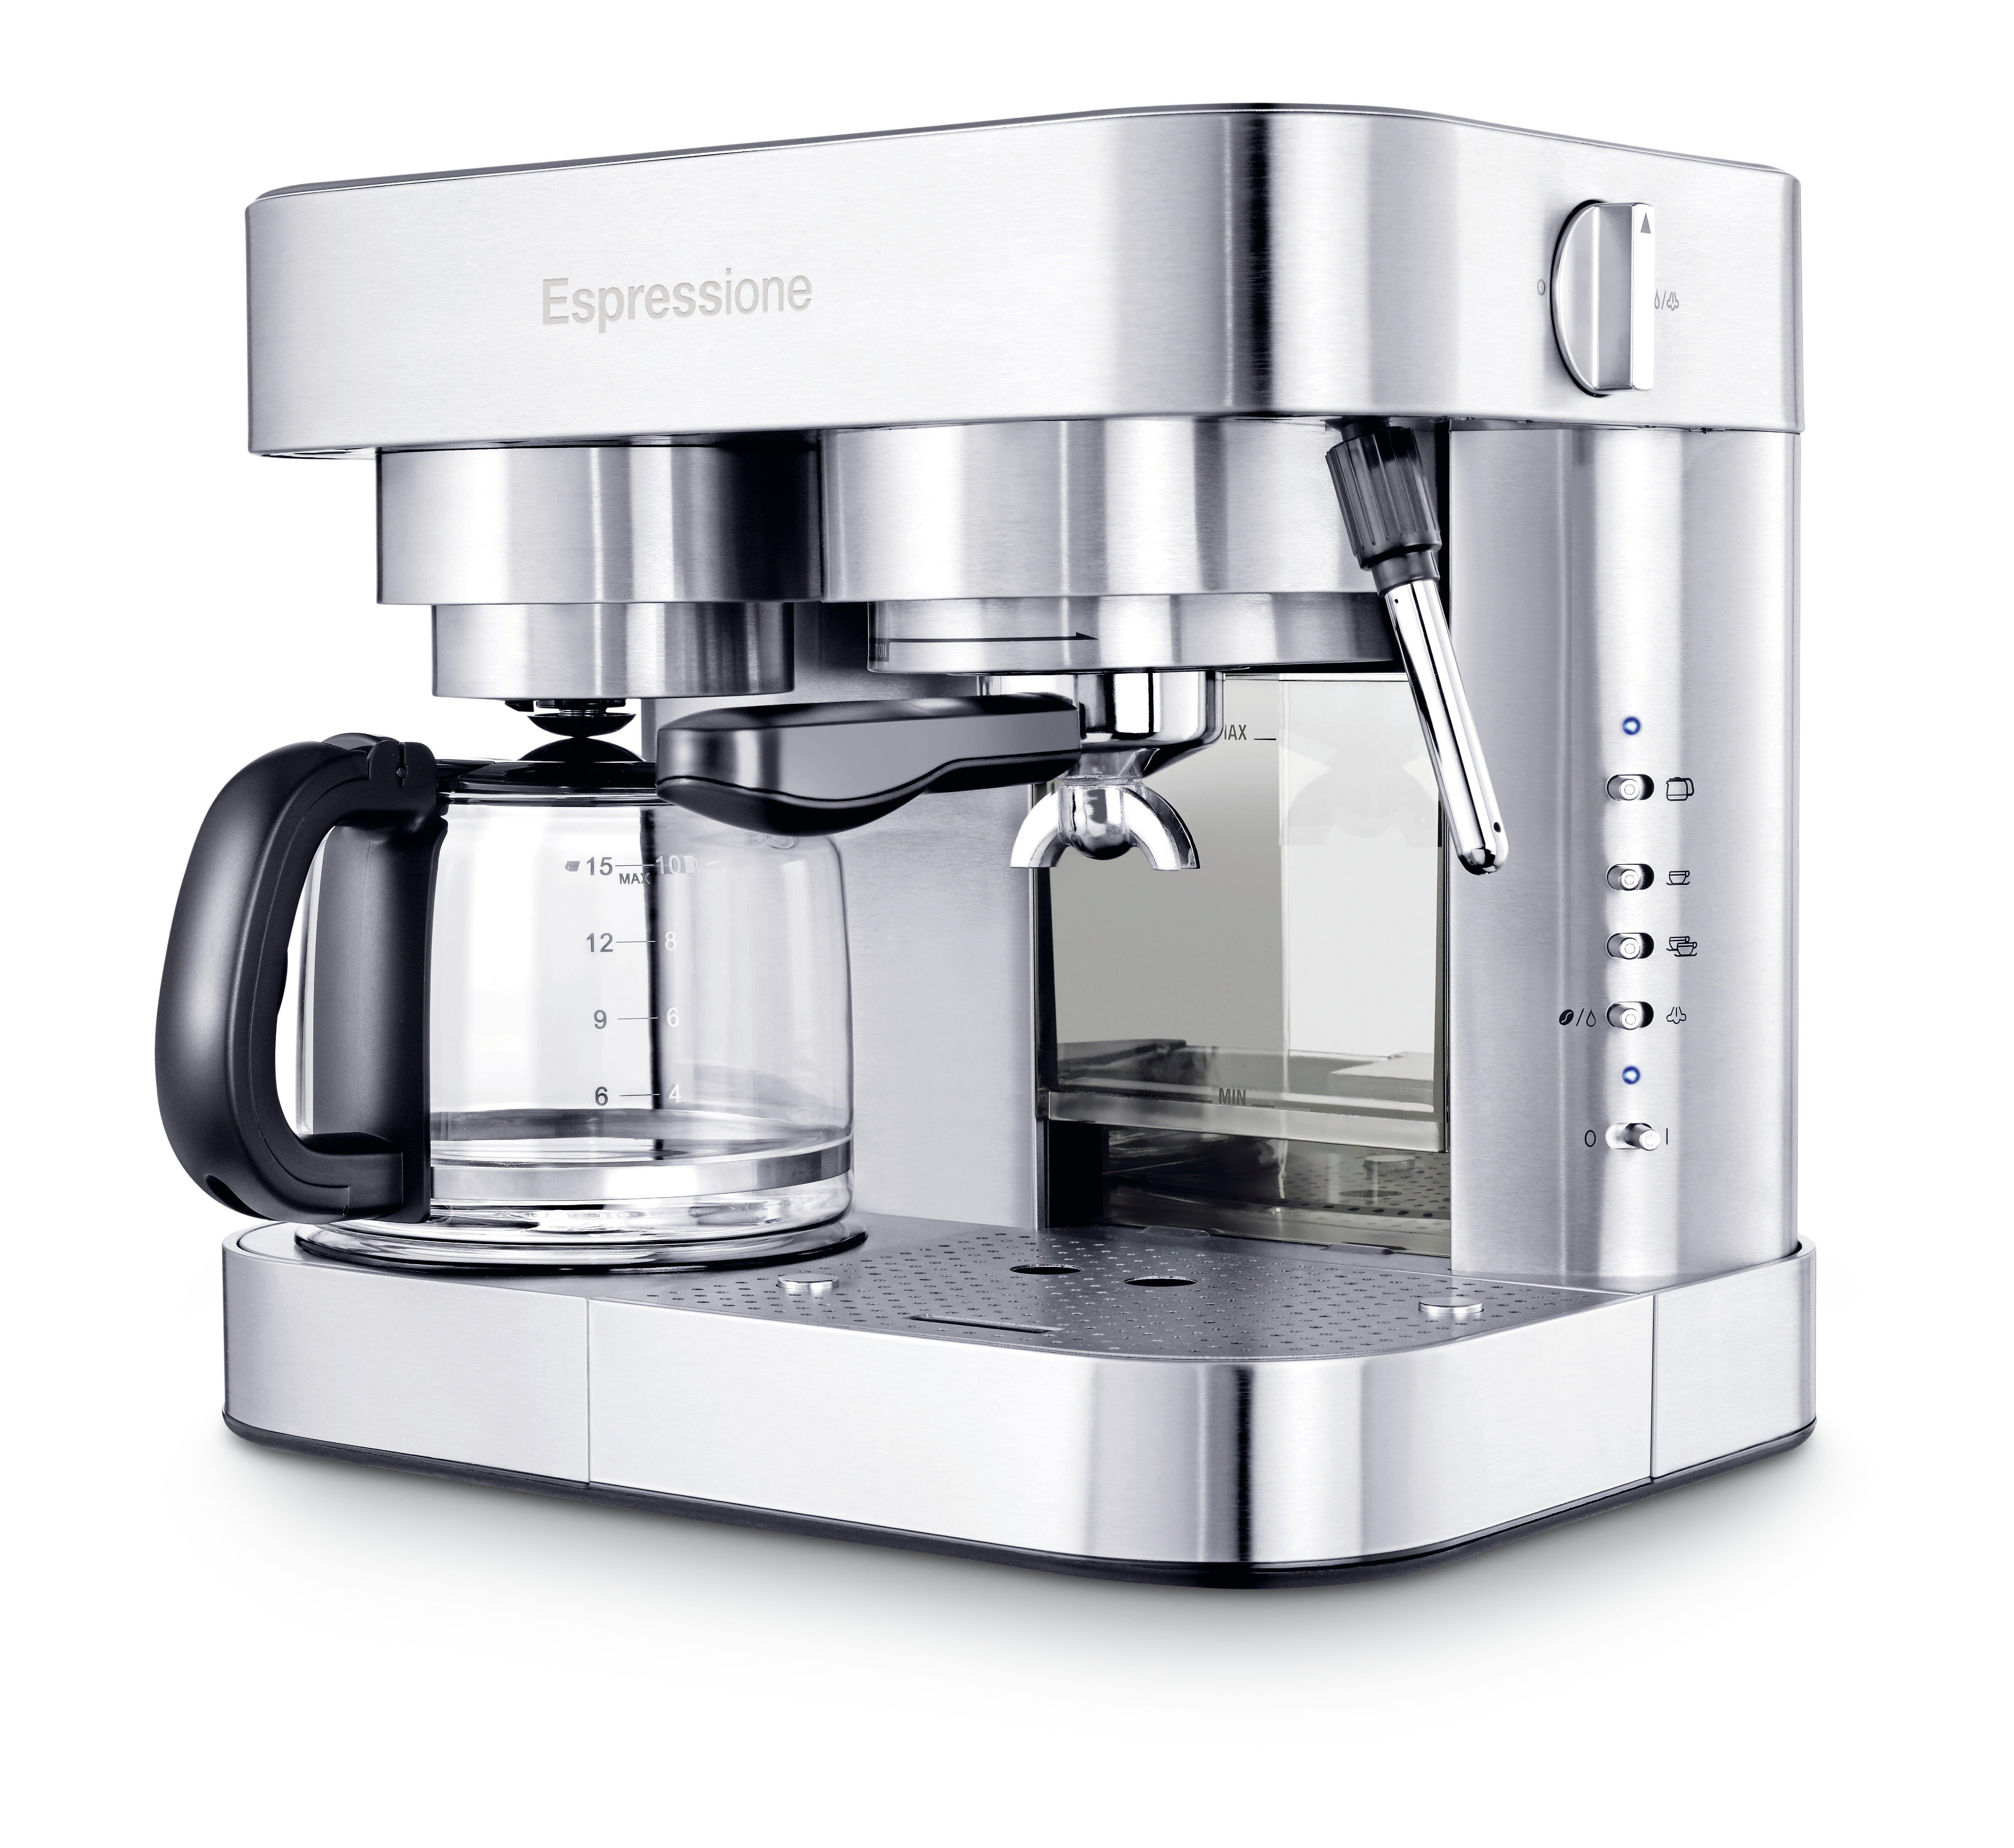 Espressione Stainless Steel Combination Coffee Espresso Maker Wayfair